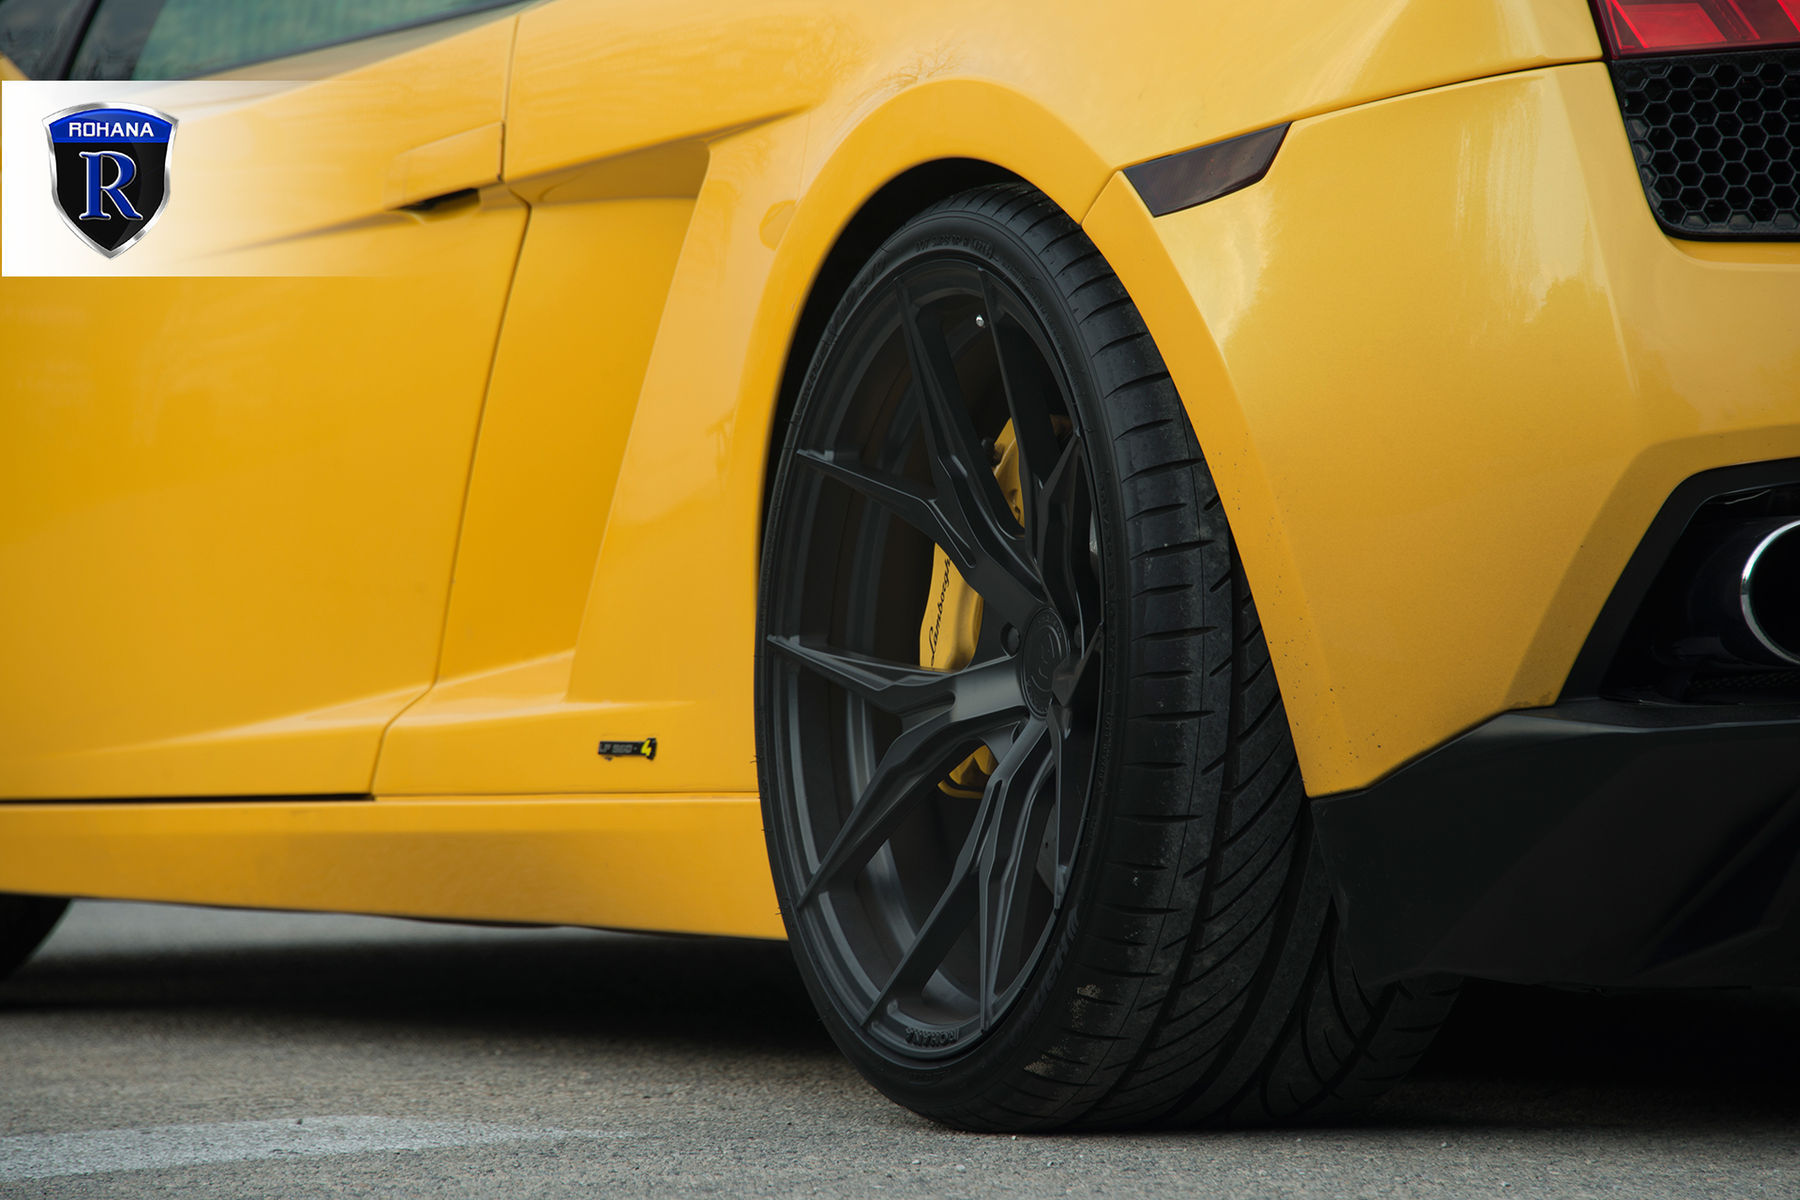 2010 Lamborghini Gallardo | Lamborghini Gallardo